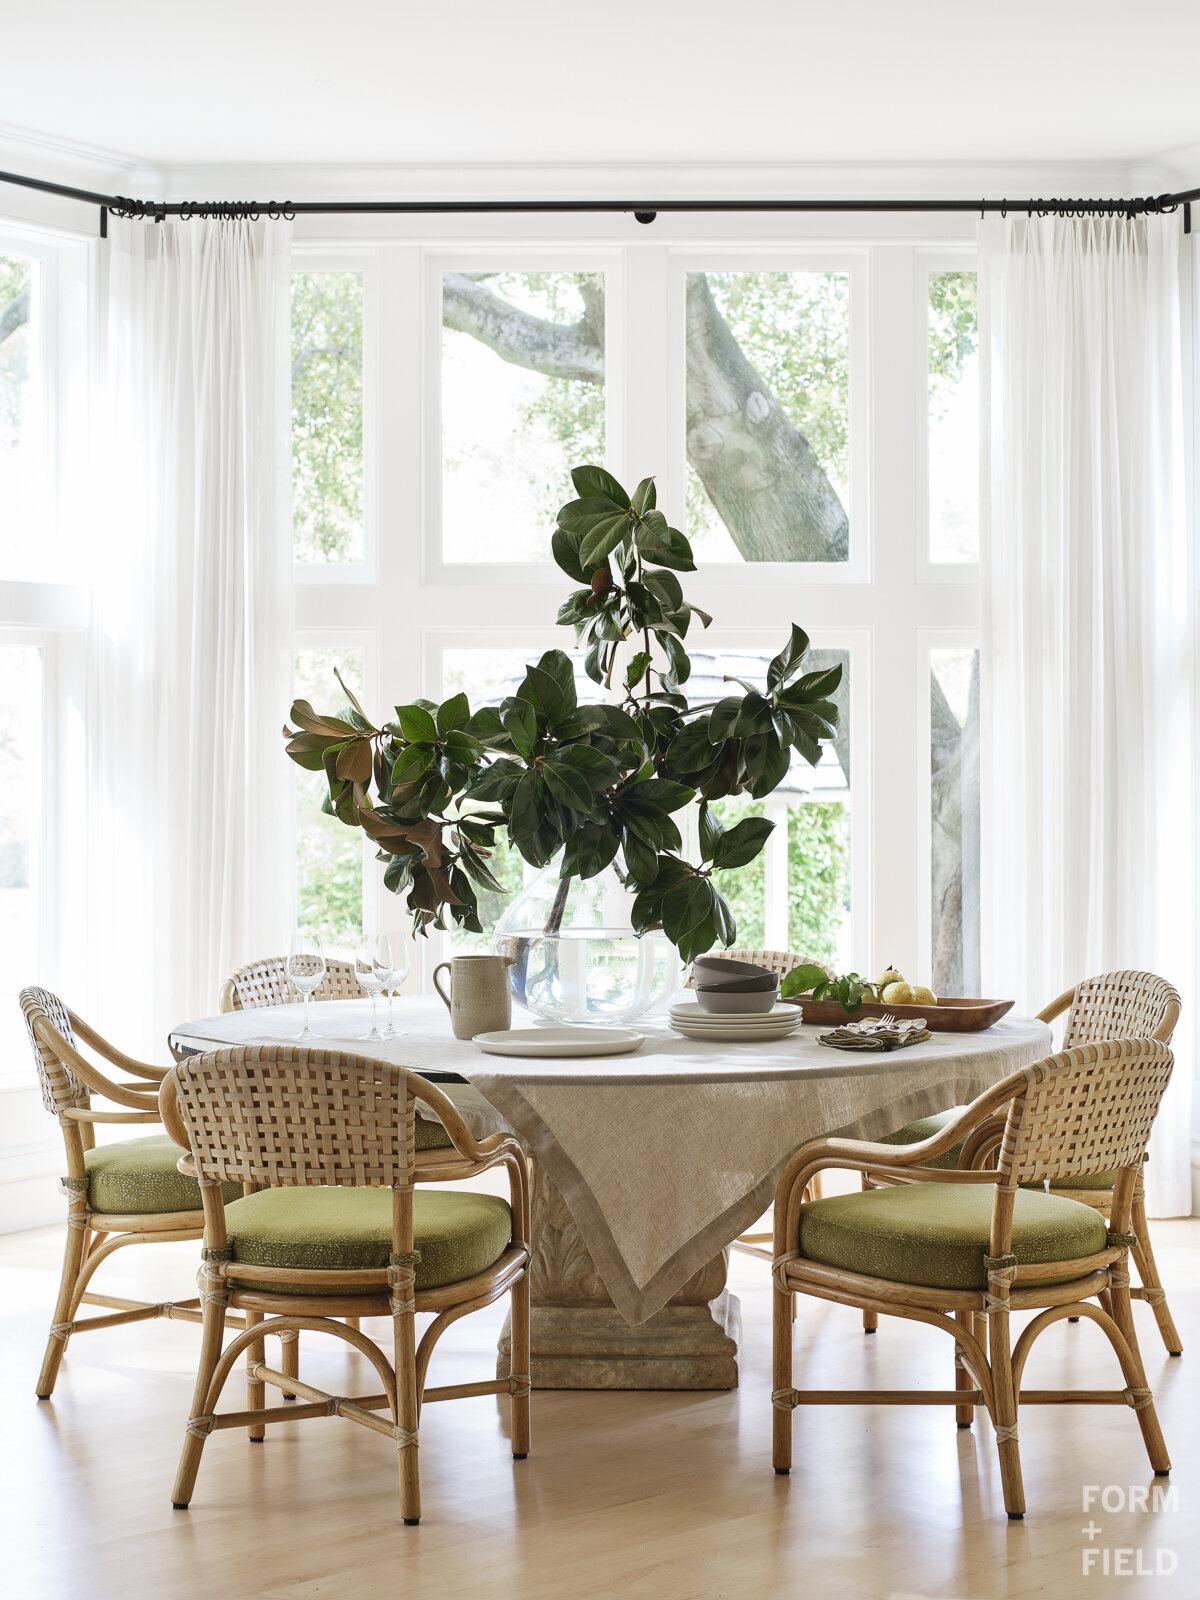 Atherton Estate Breakfast Room